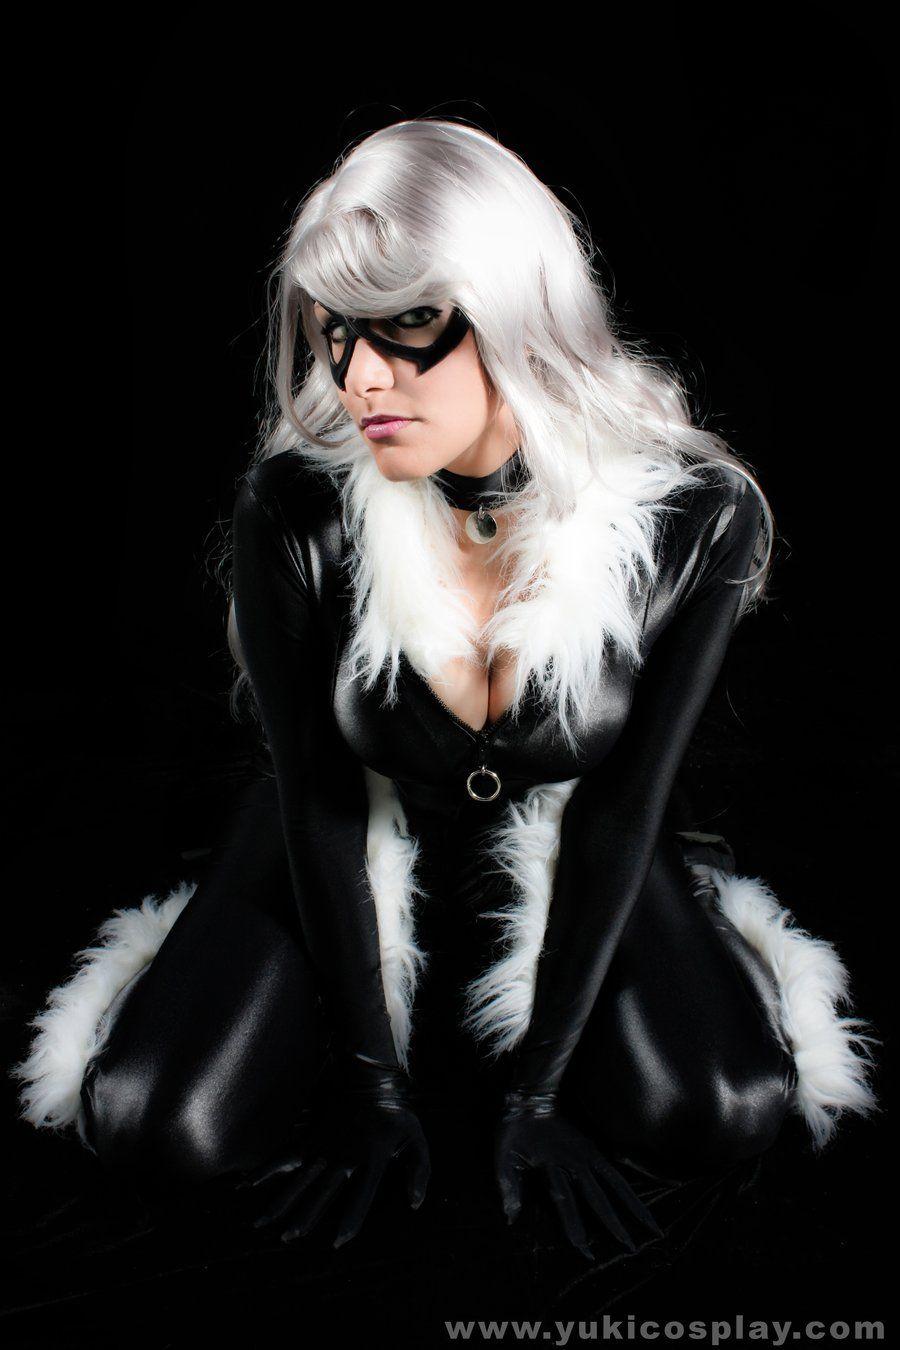 Black cat cosplay hot